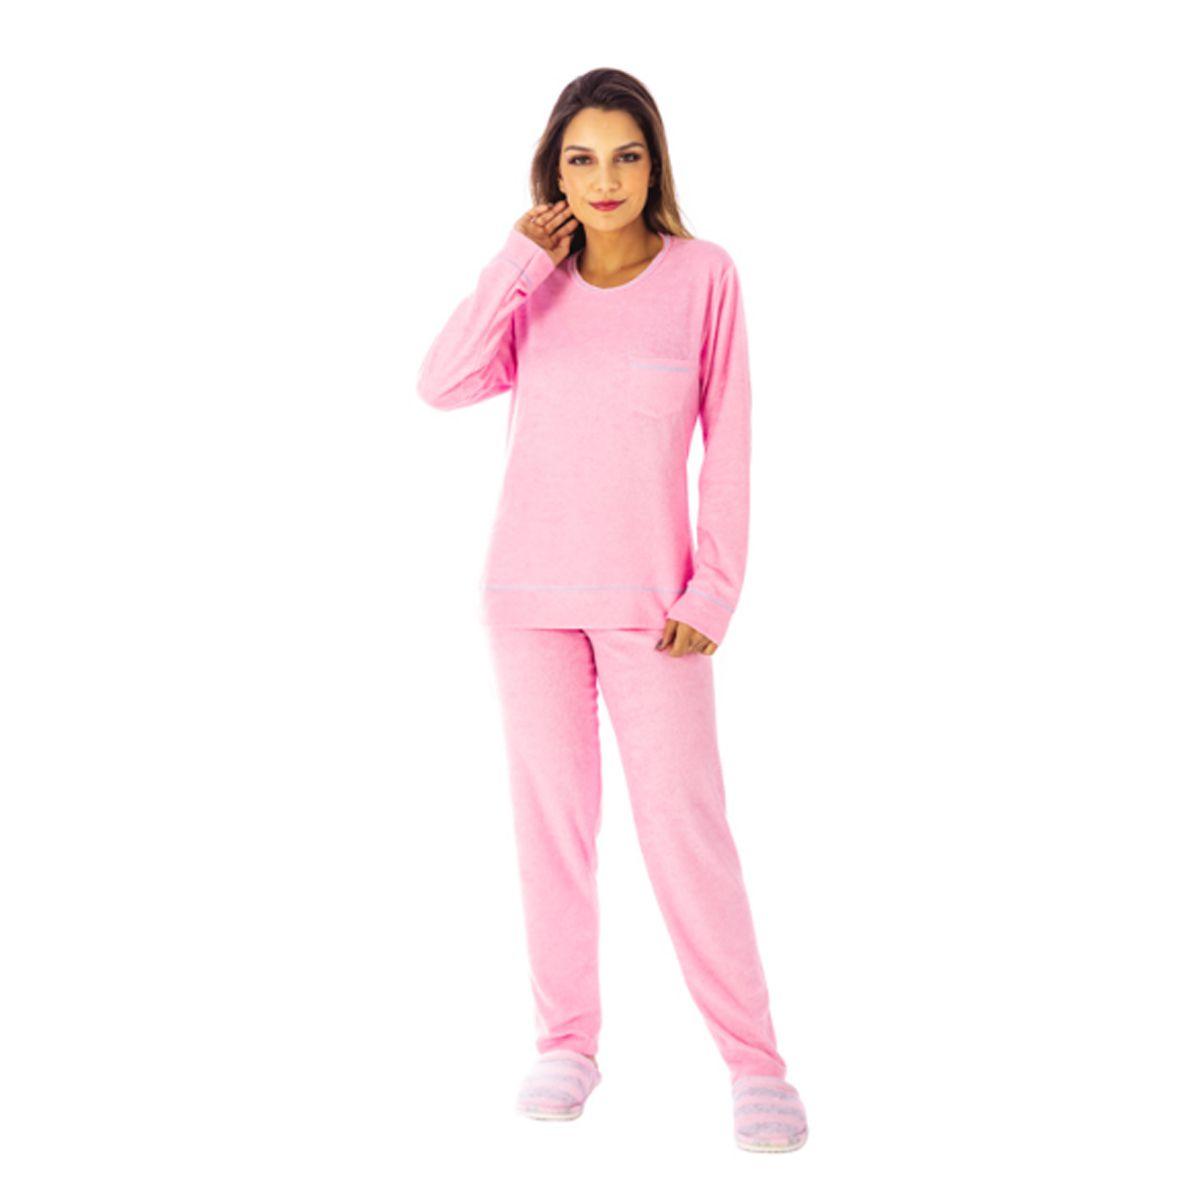 Pijama de inverno feminino plush BOLSINHO Victory